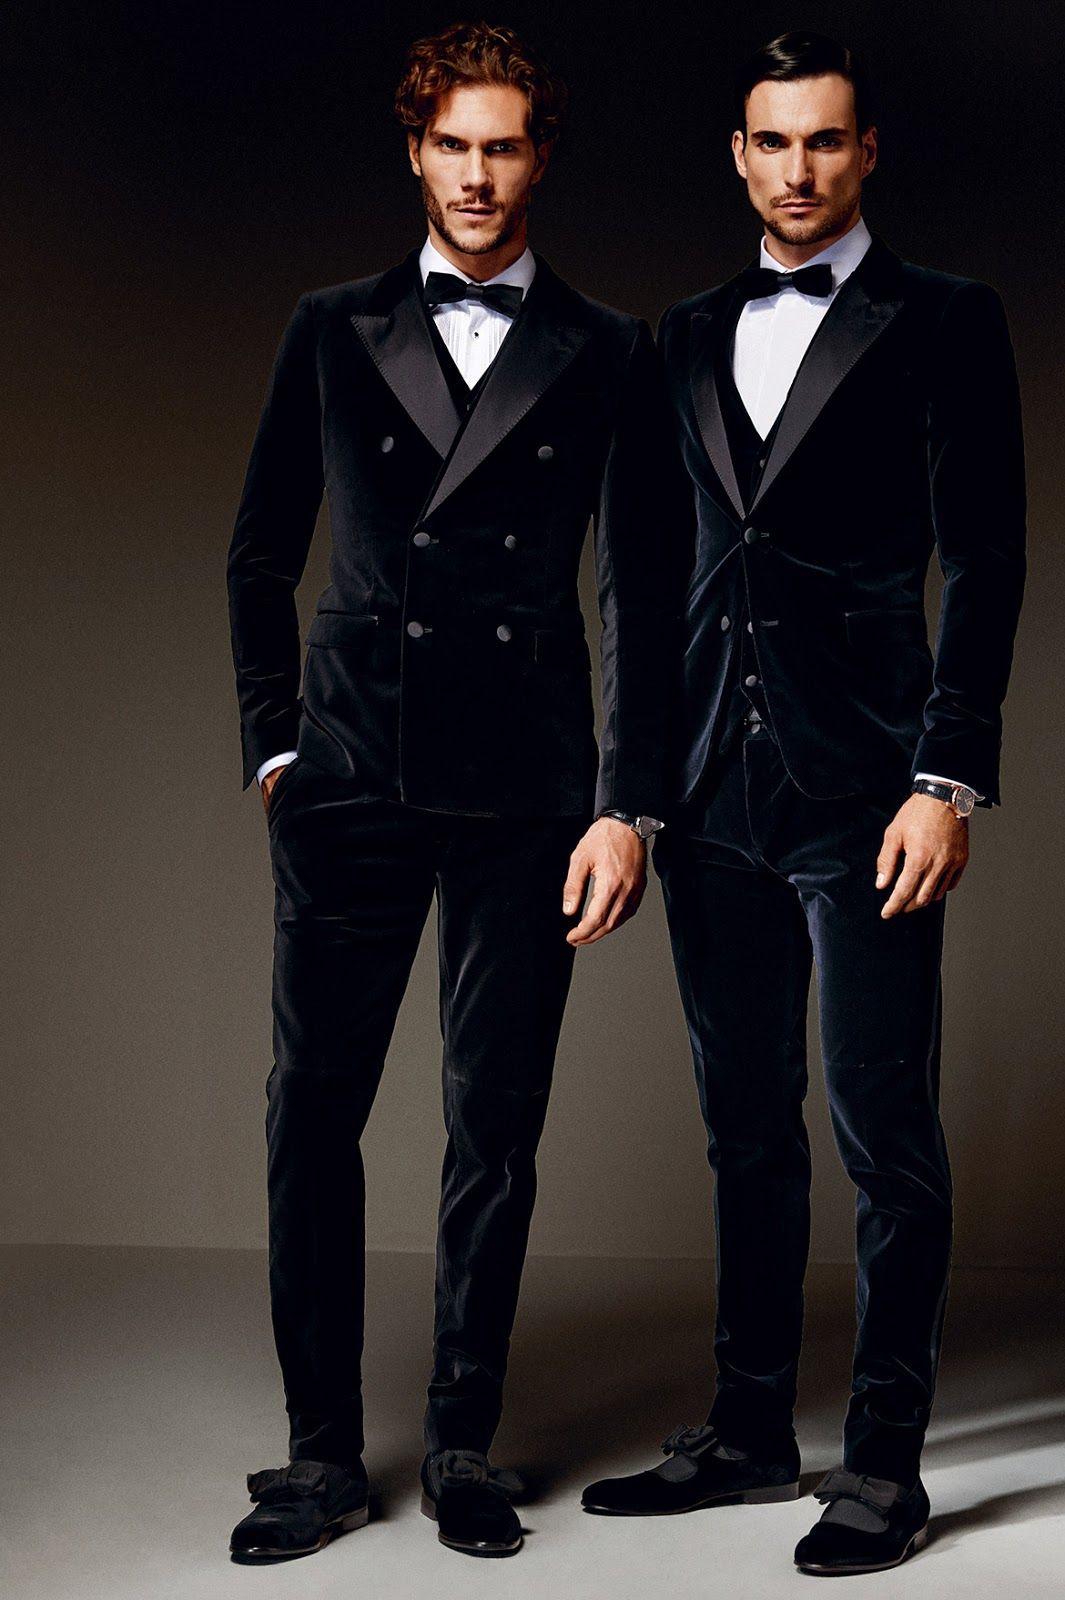 cfcb1c28ca36 Black tie affair.....Dolce and Gabbana